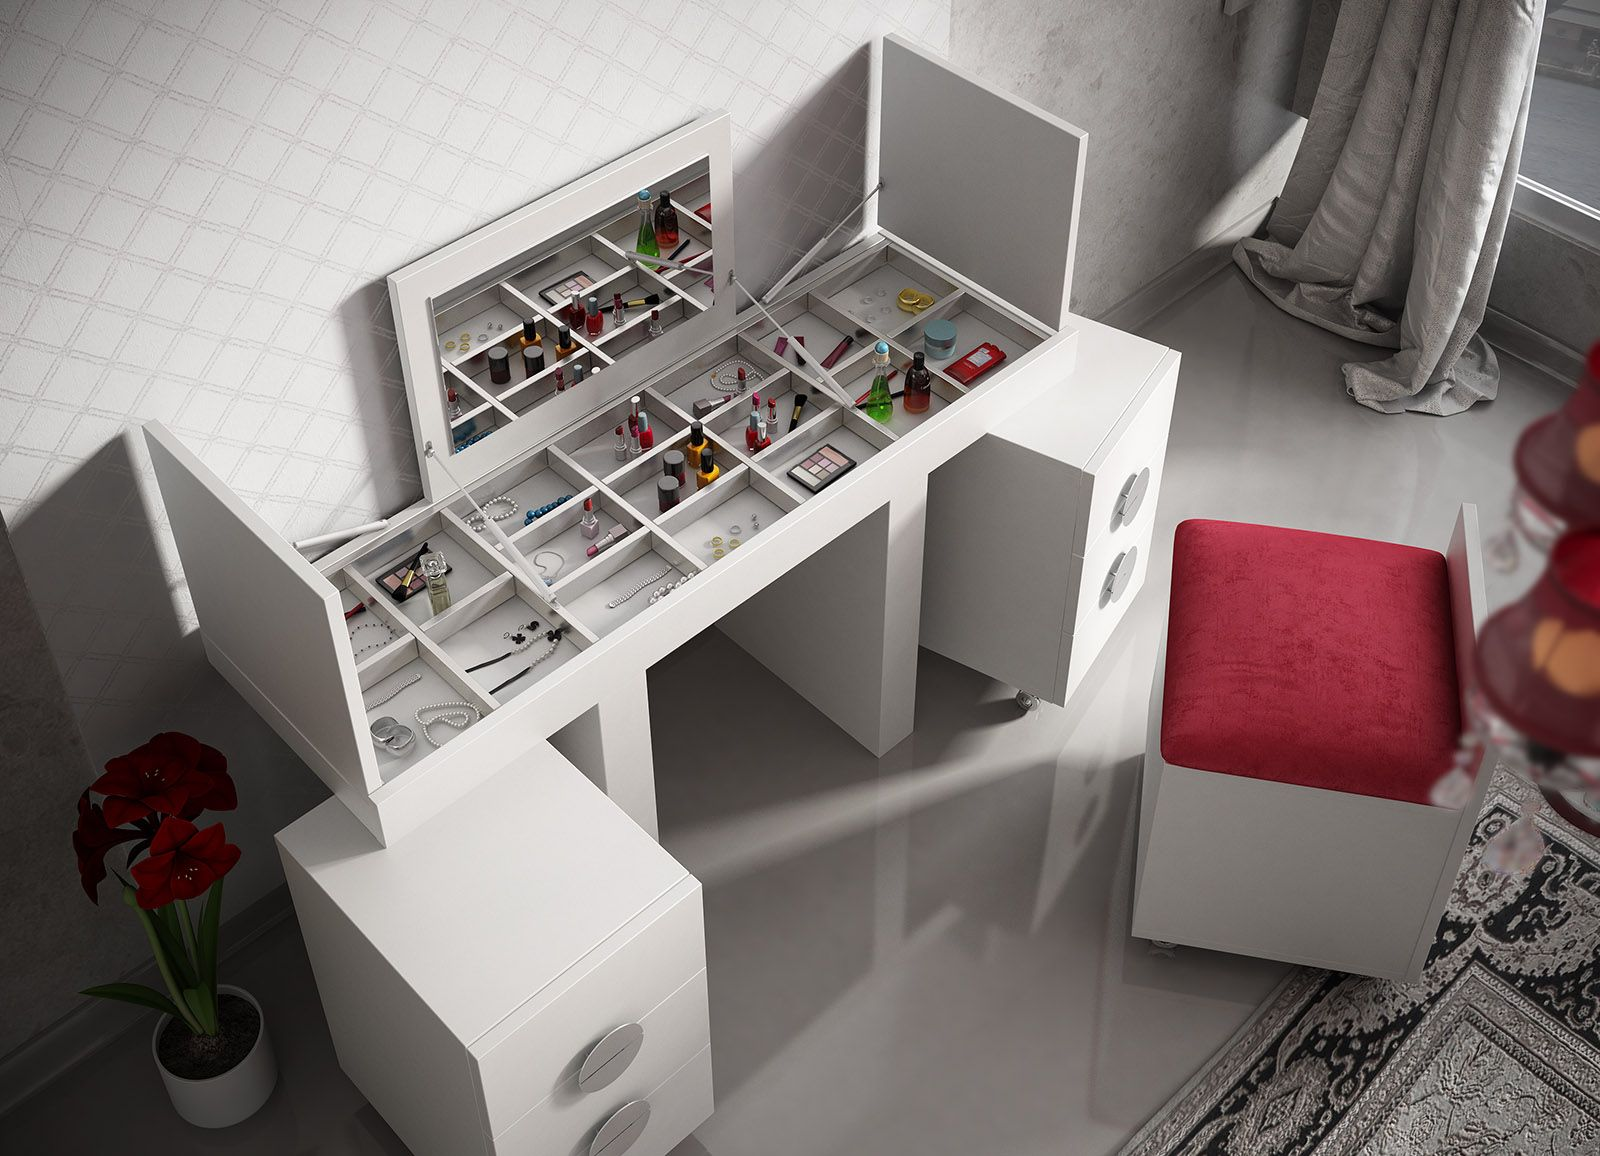 Tocador de franco furniture fabricante de muebles septiembre 2015 proyecto tocador - Fabricante muebles ...